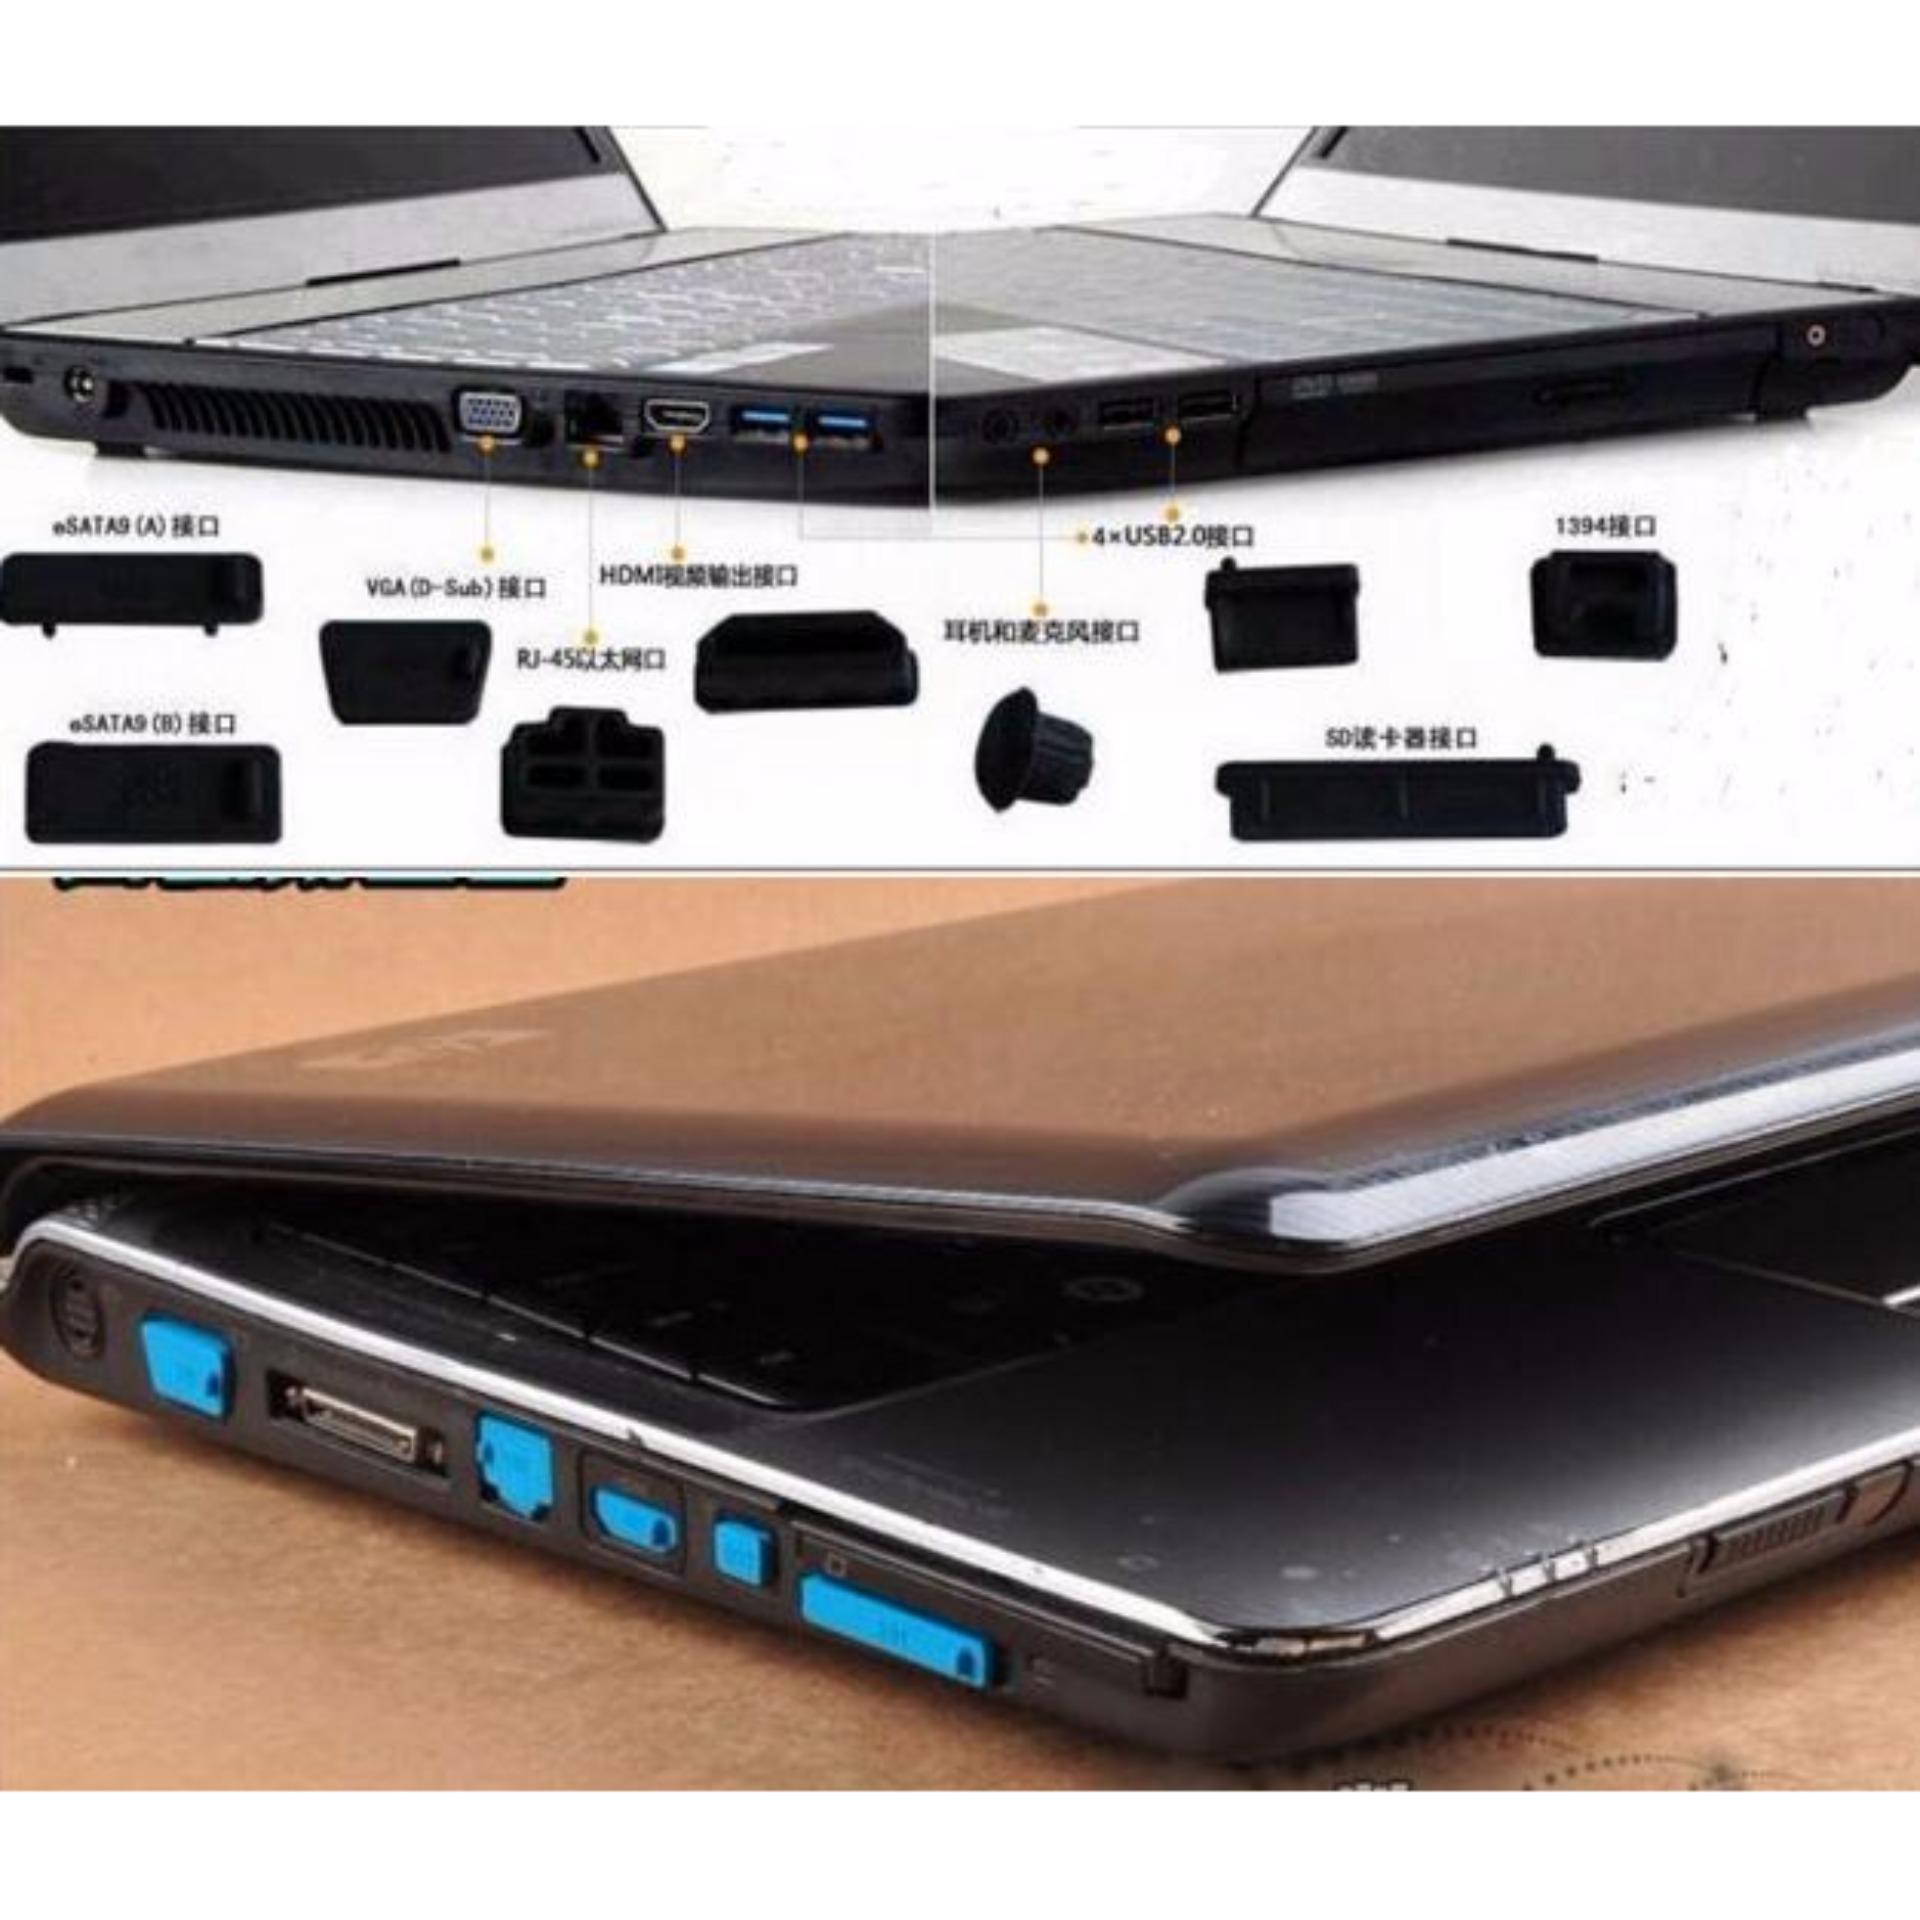 Jual Beli Universal Original Kabel Power Laptop Notebook 150 Cm 1 Set Karet Penutup Port Lubang Untuk